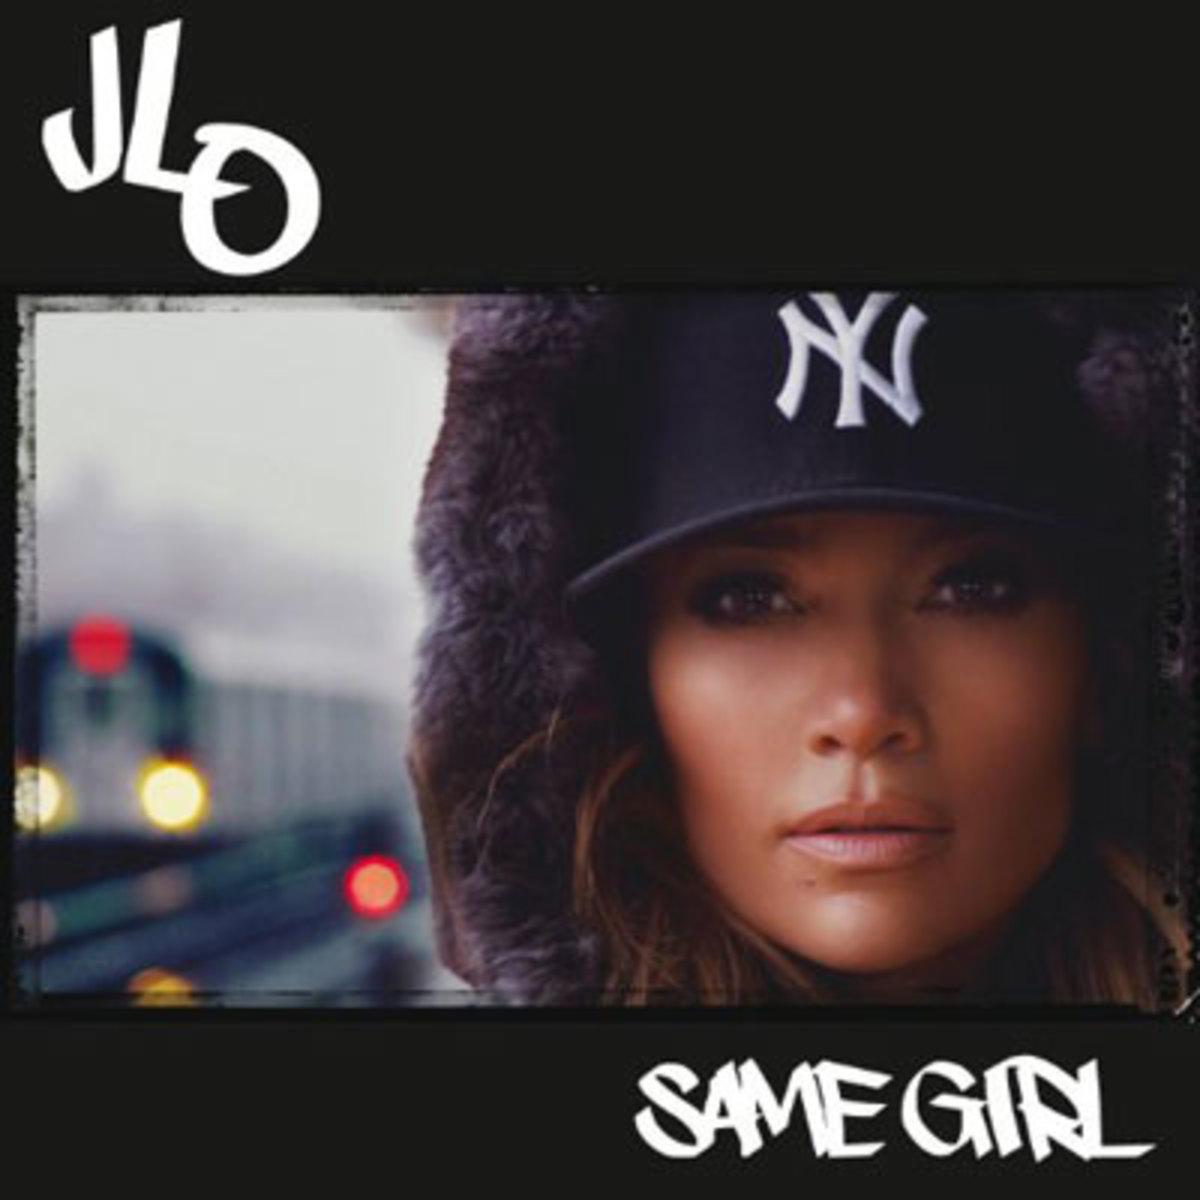 jlo-samegirl.jpg